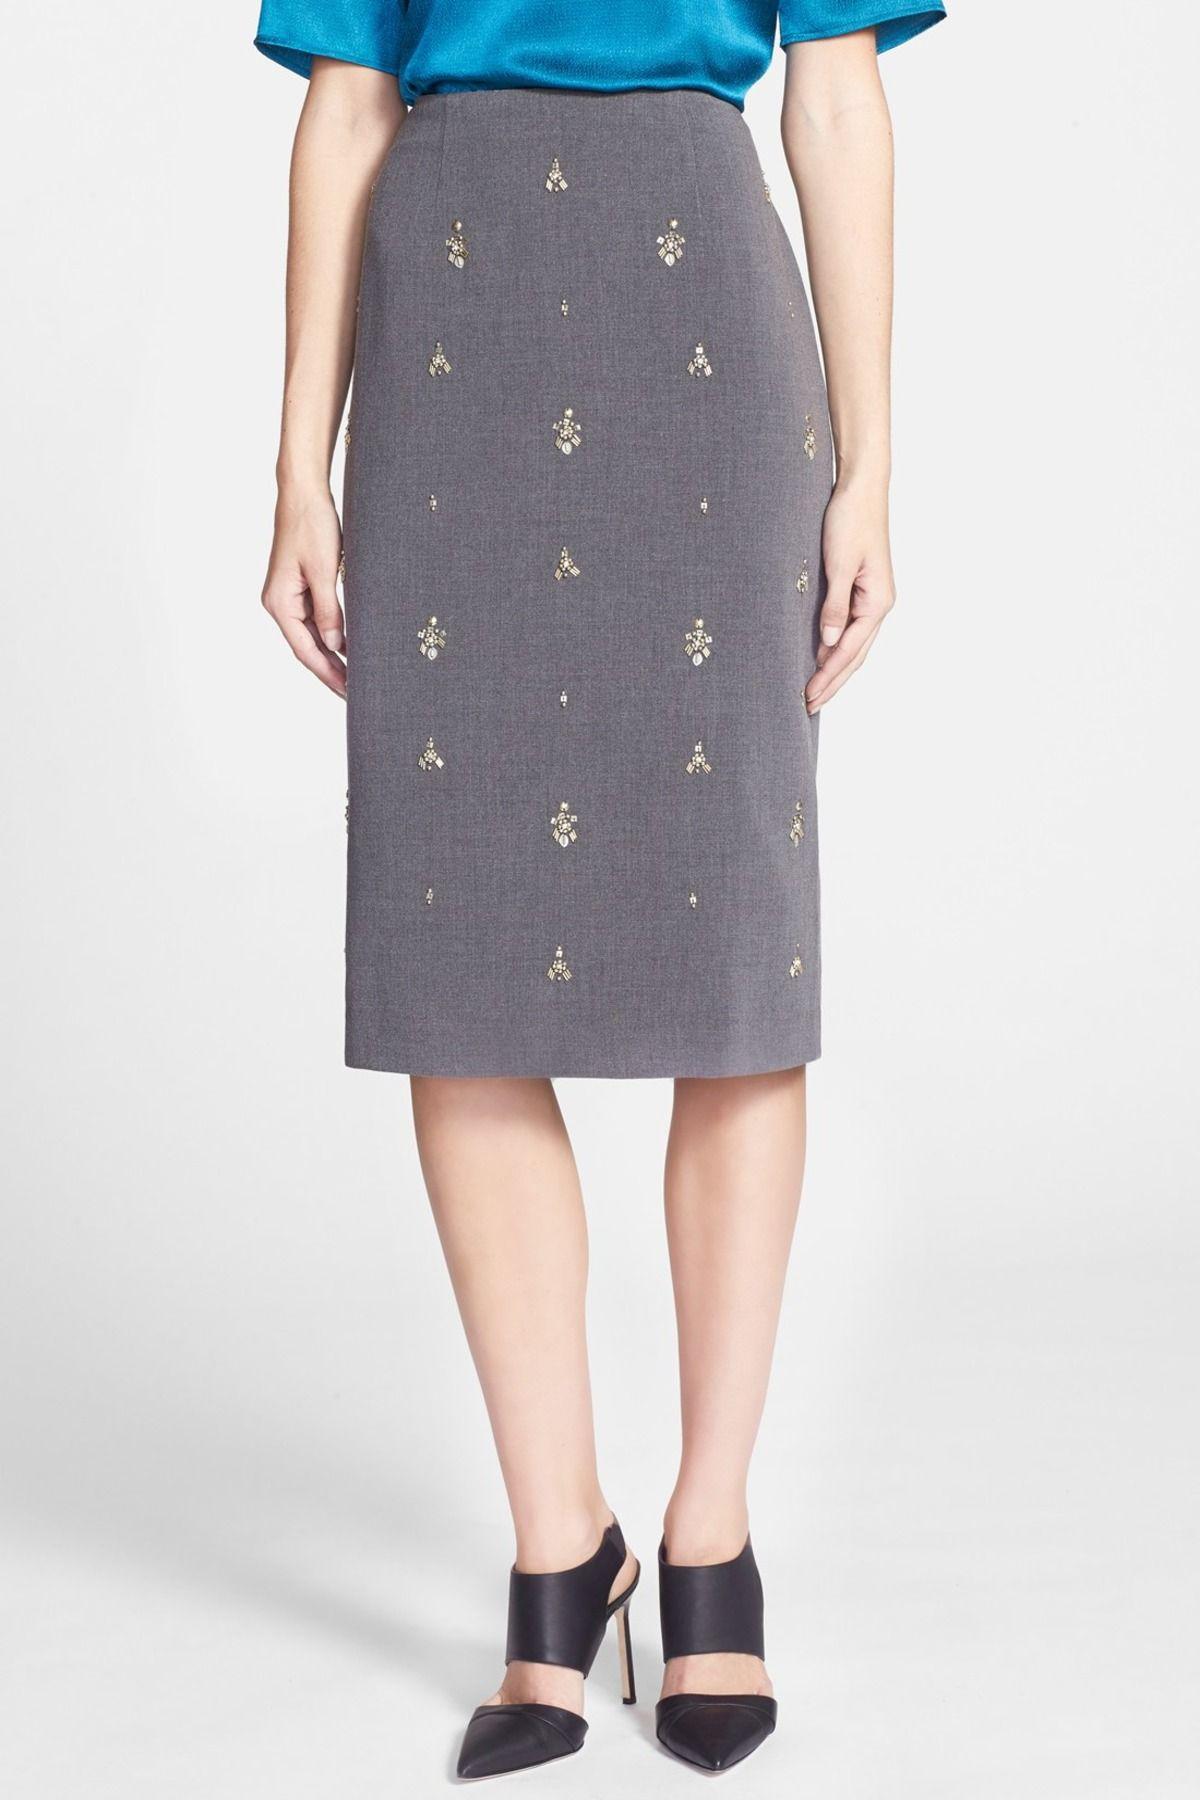 Chelsea28 Embellished Pencil Skirt by Chelsea28 on @nordstrom_rack